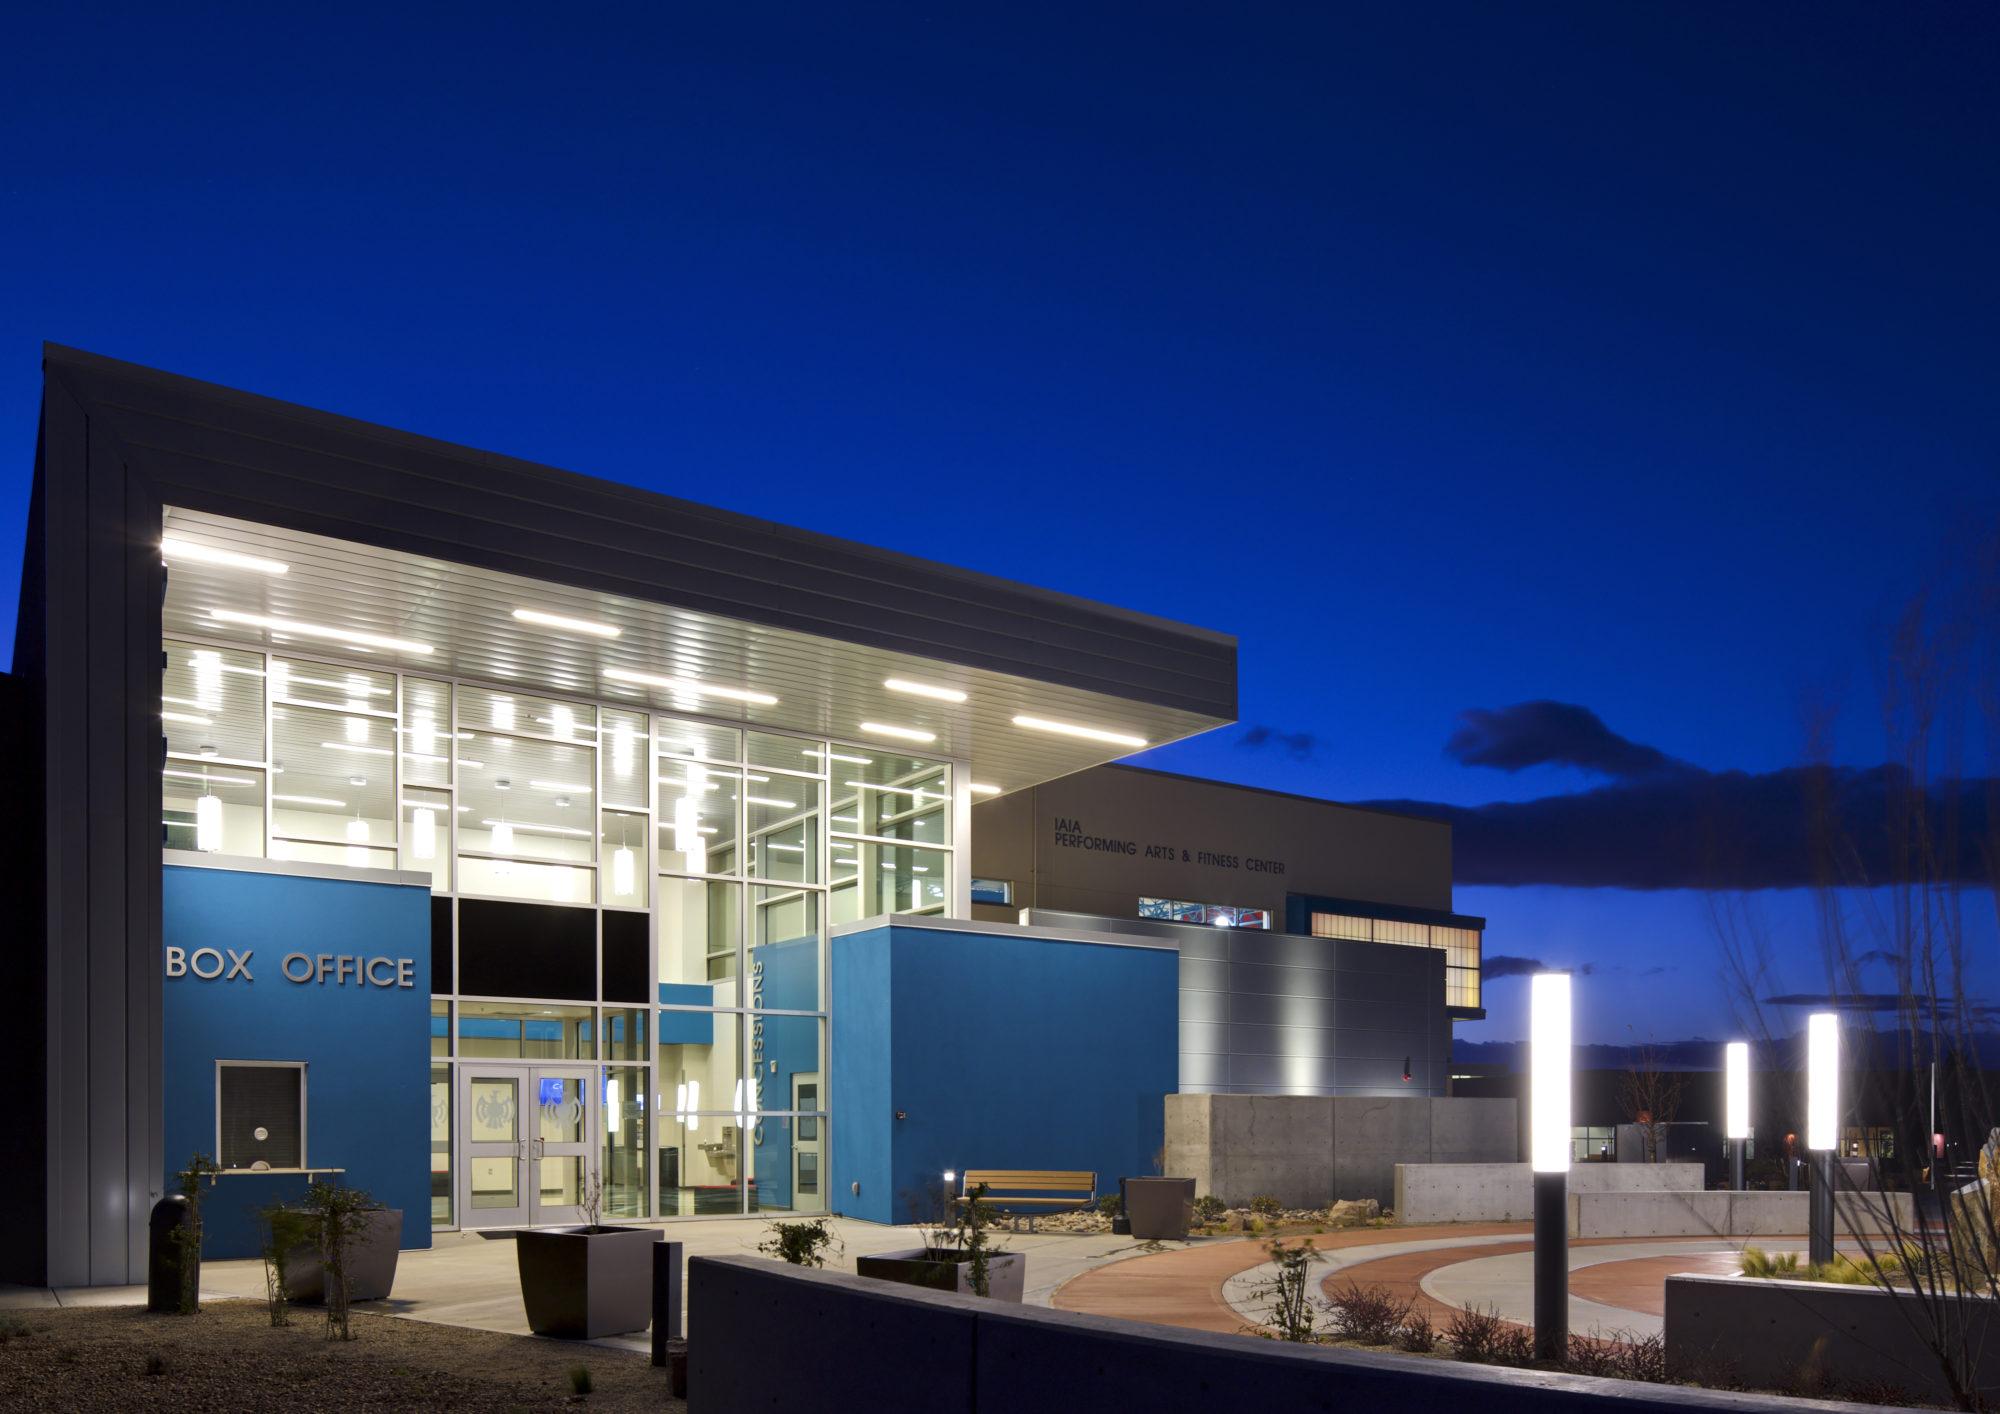 IAIA Multipurpose Performing Arts & Fitness Center 5